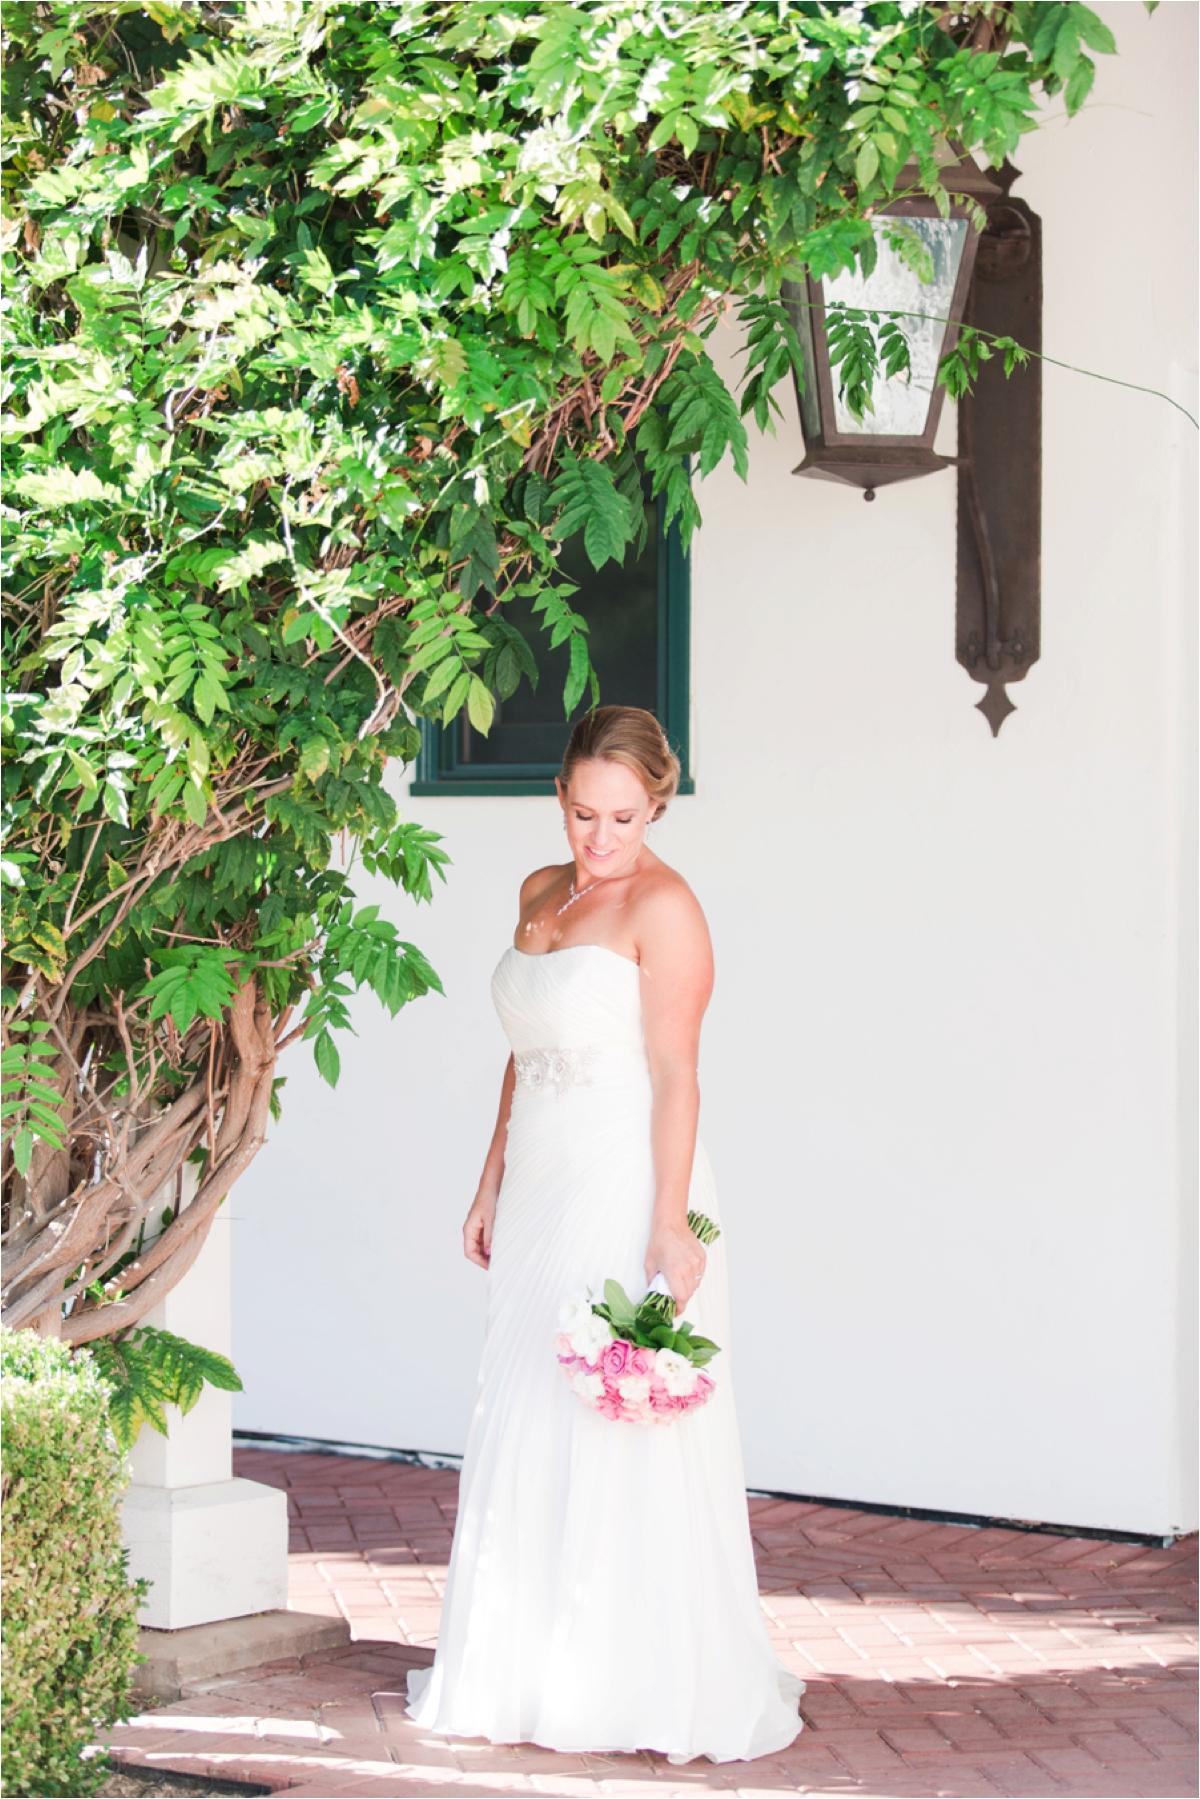 Eagle Ridge Golf Club wedding pictures by Briana Calderon Photography_0418.jpg